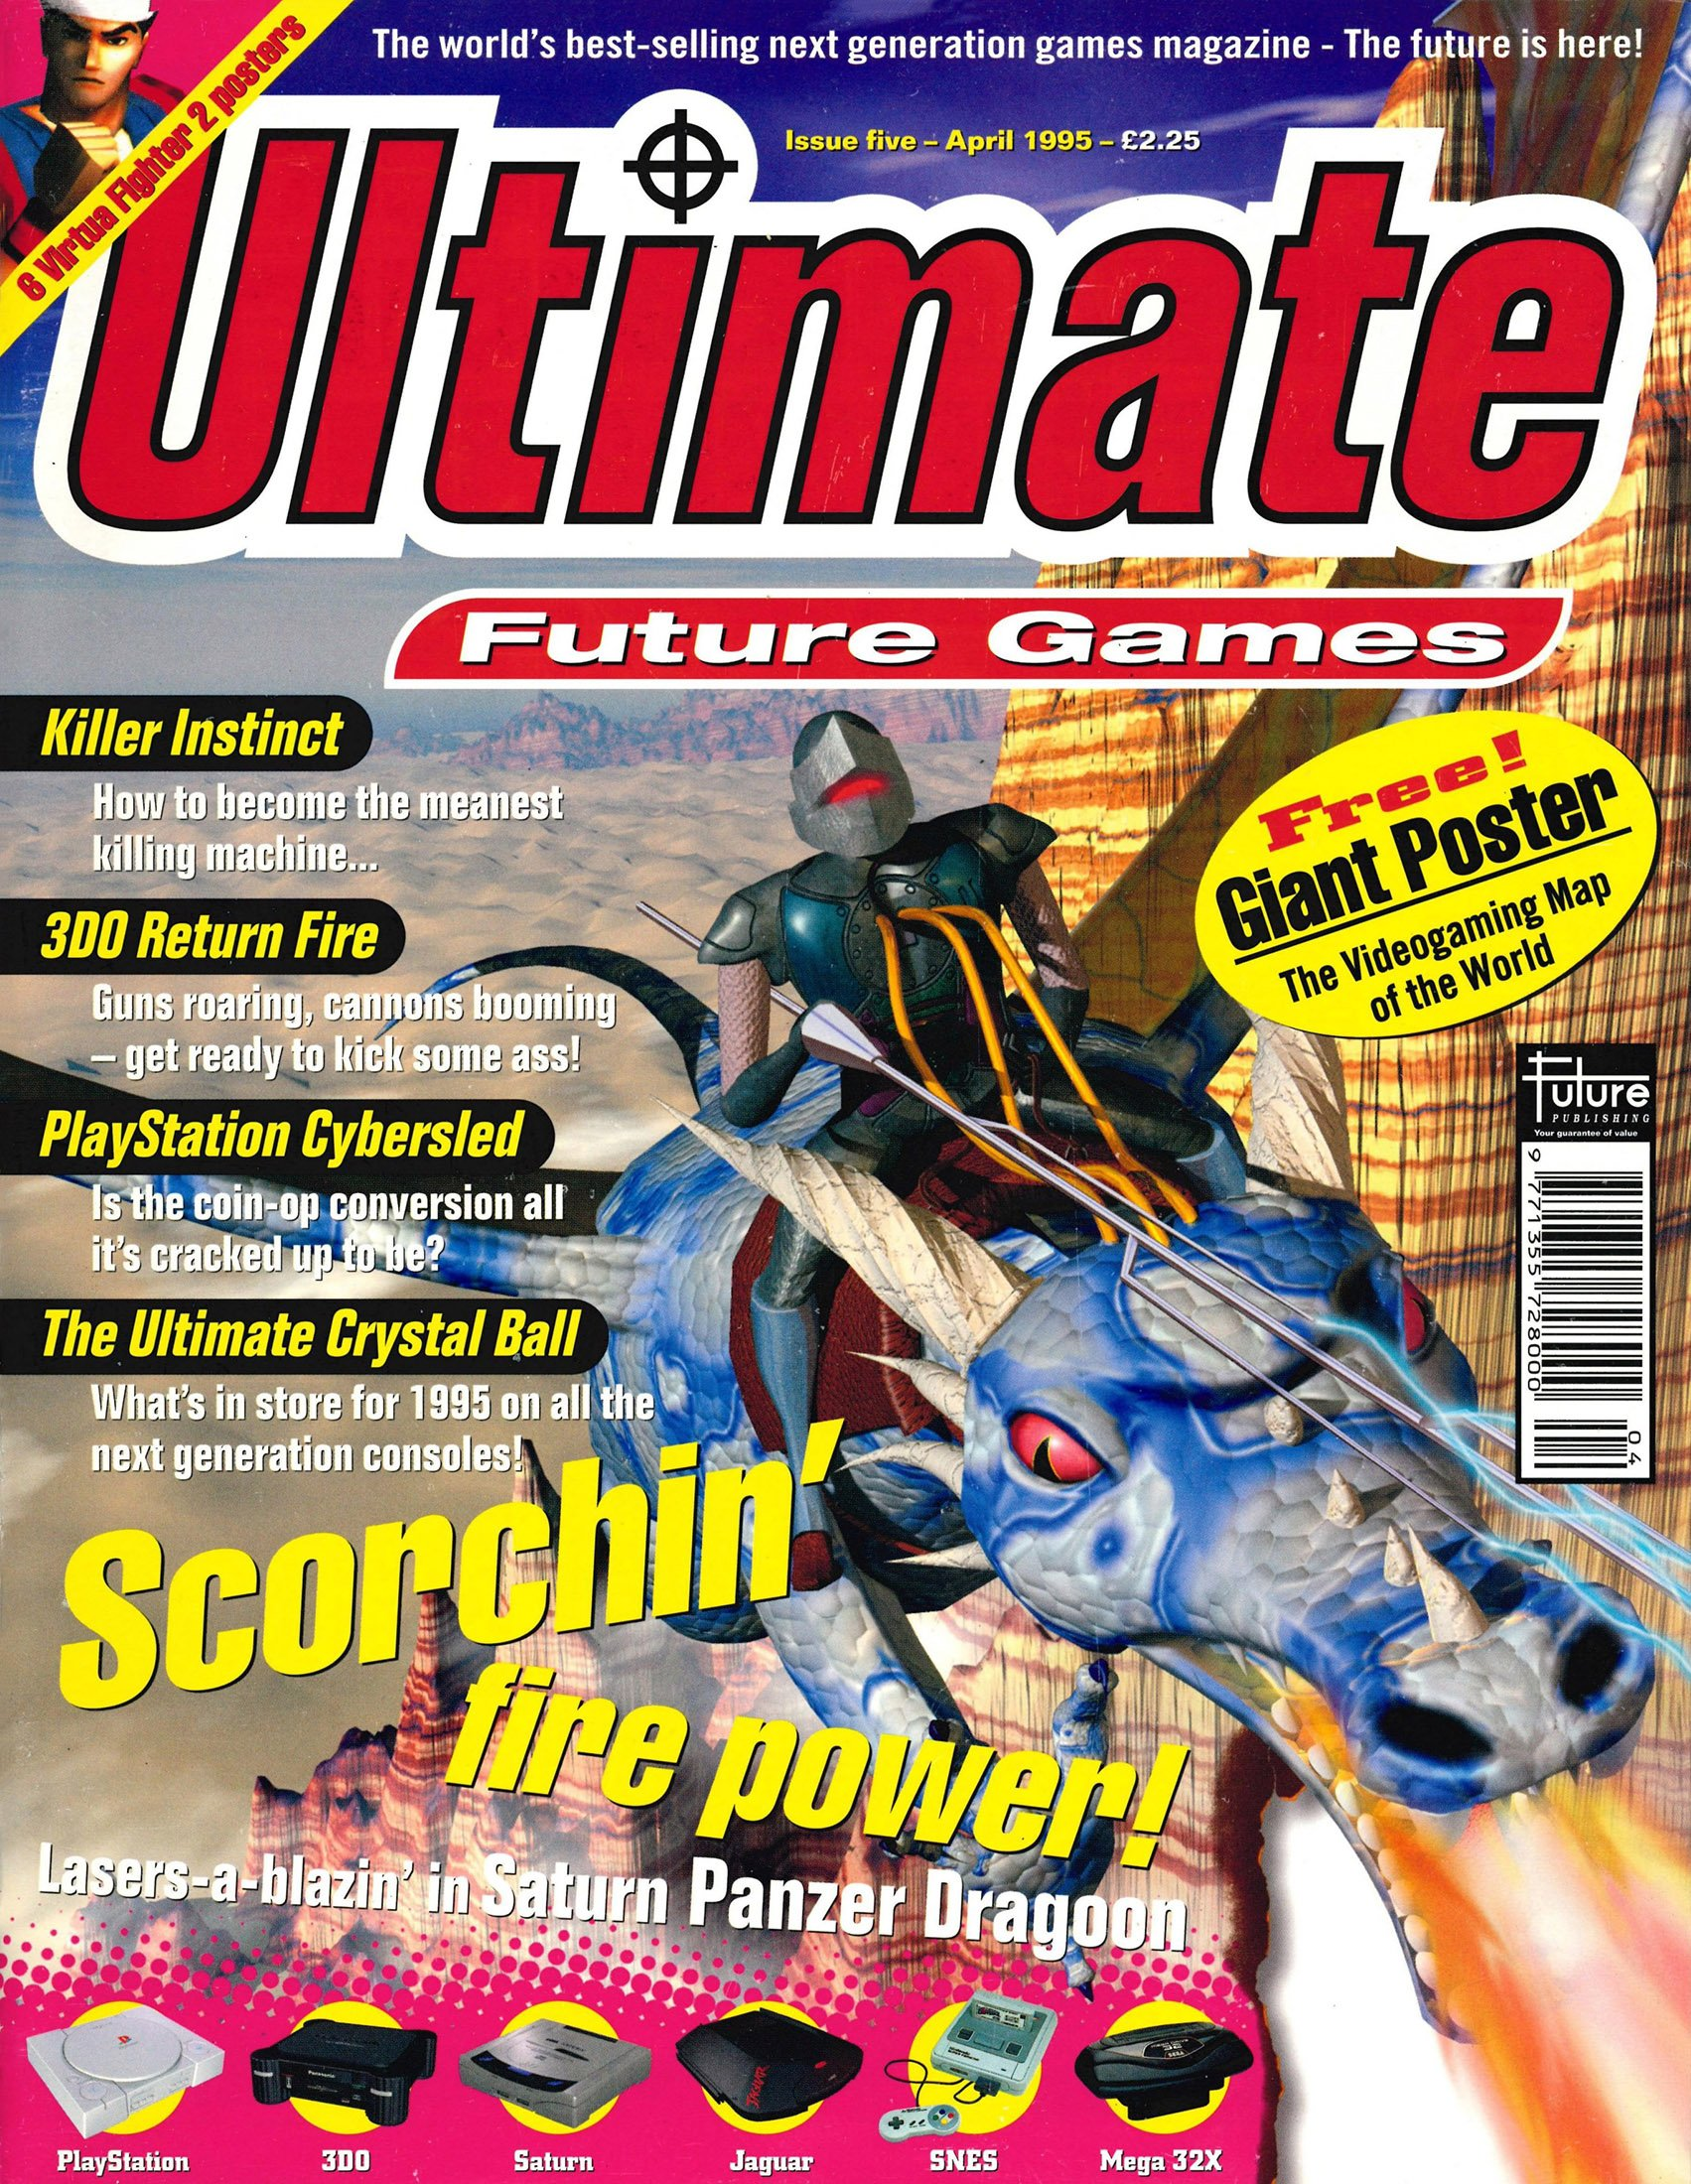 Ultimate Future Games 05 (April 1995)